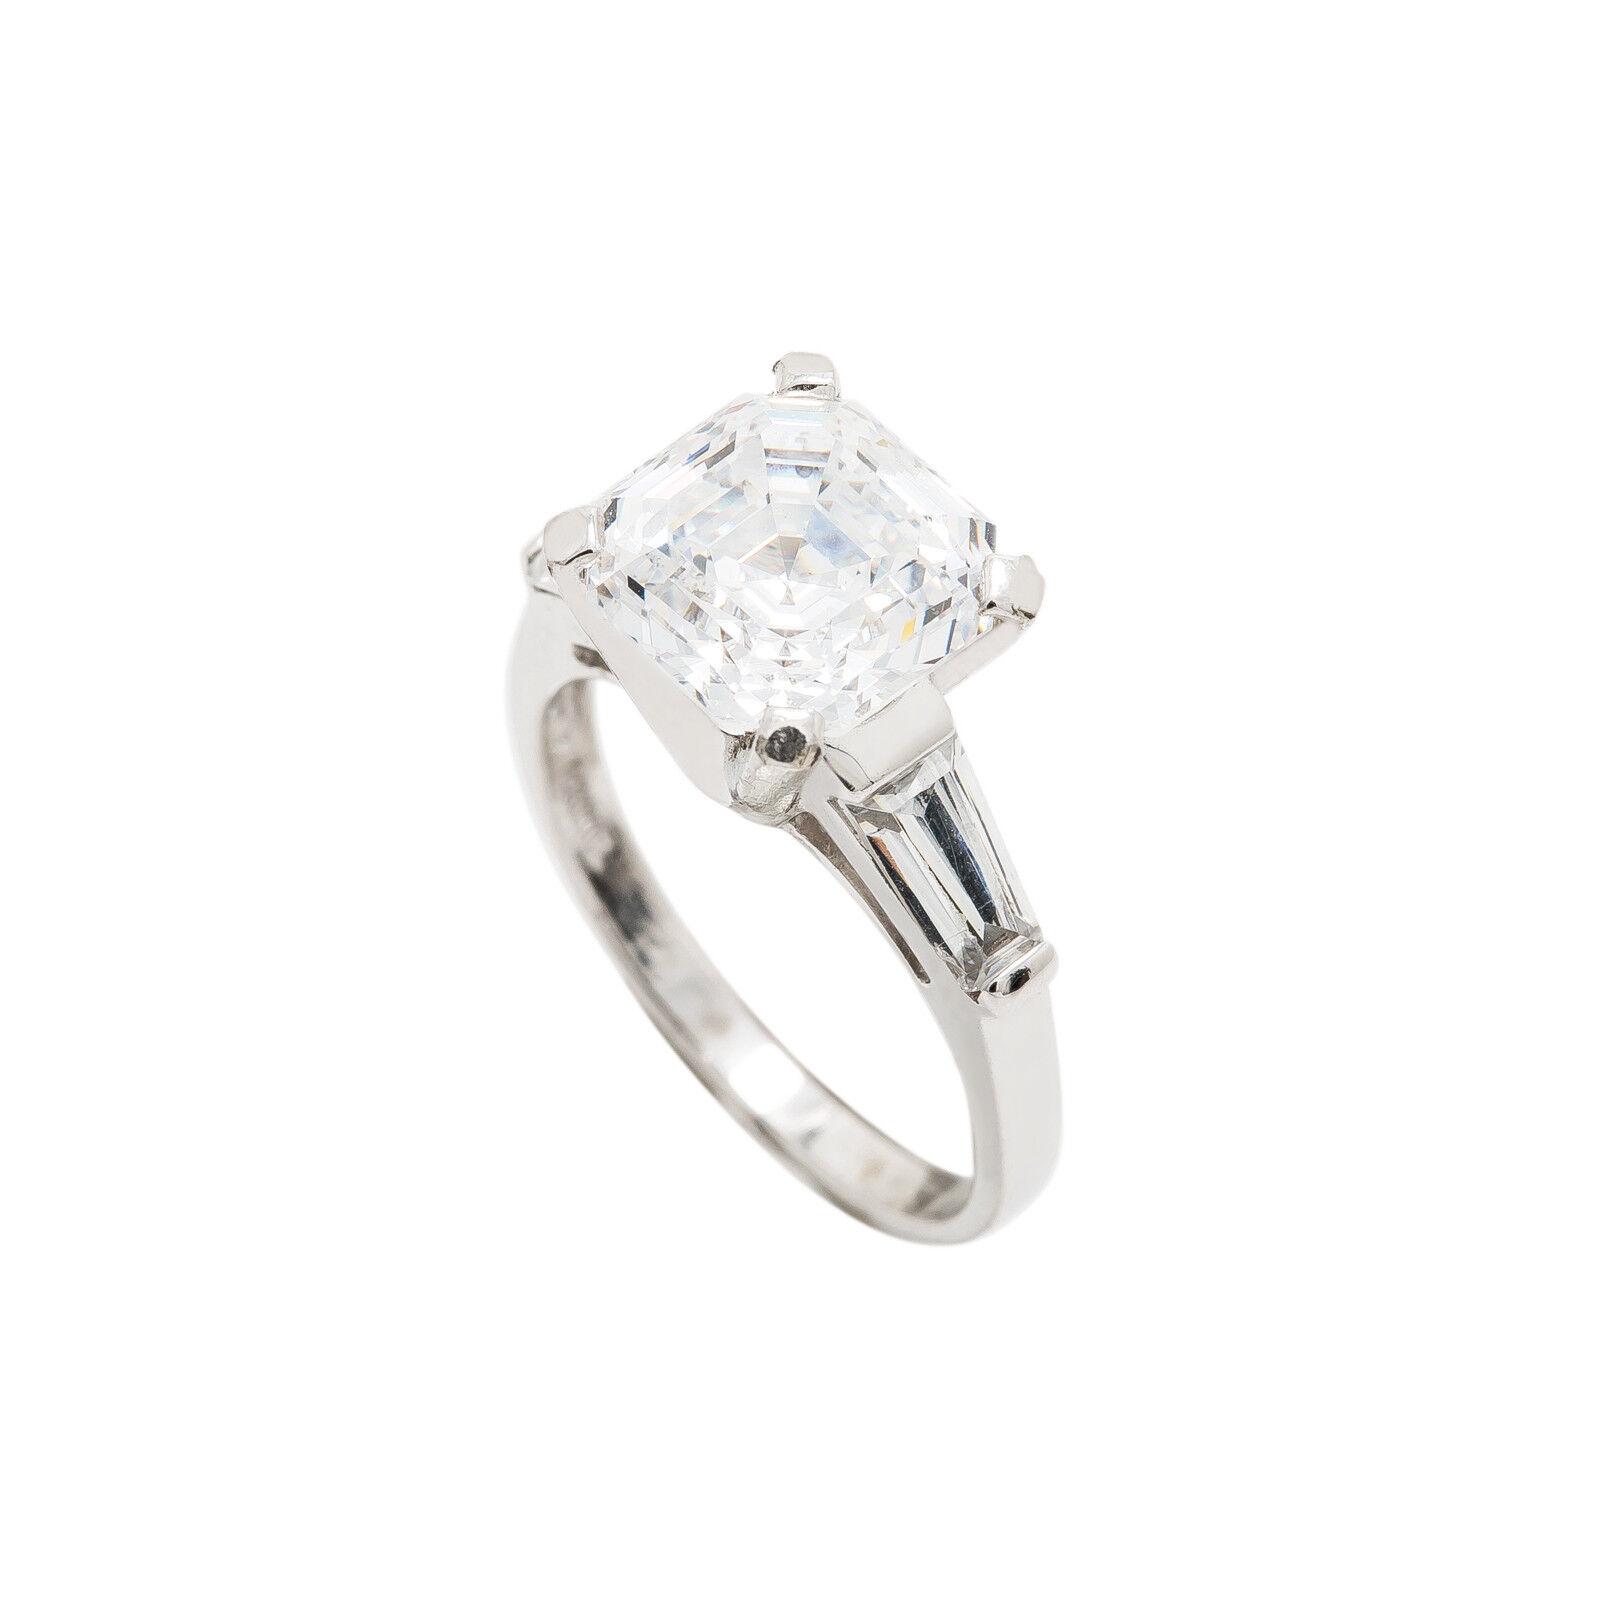 601a83b00019d Zirconium Cubic gold White 14K Ring Setting Engagement 4.5 Size ...